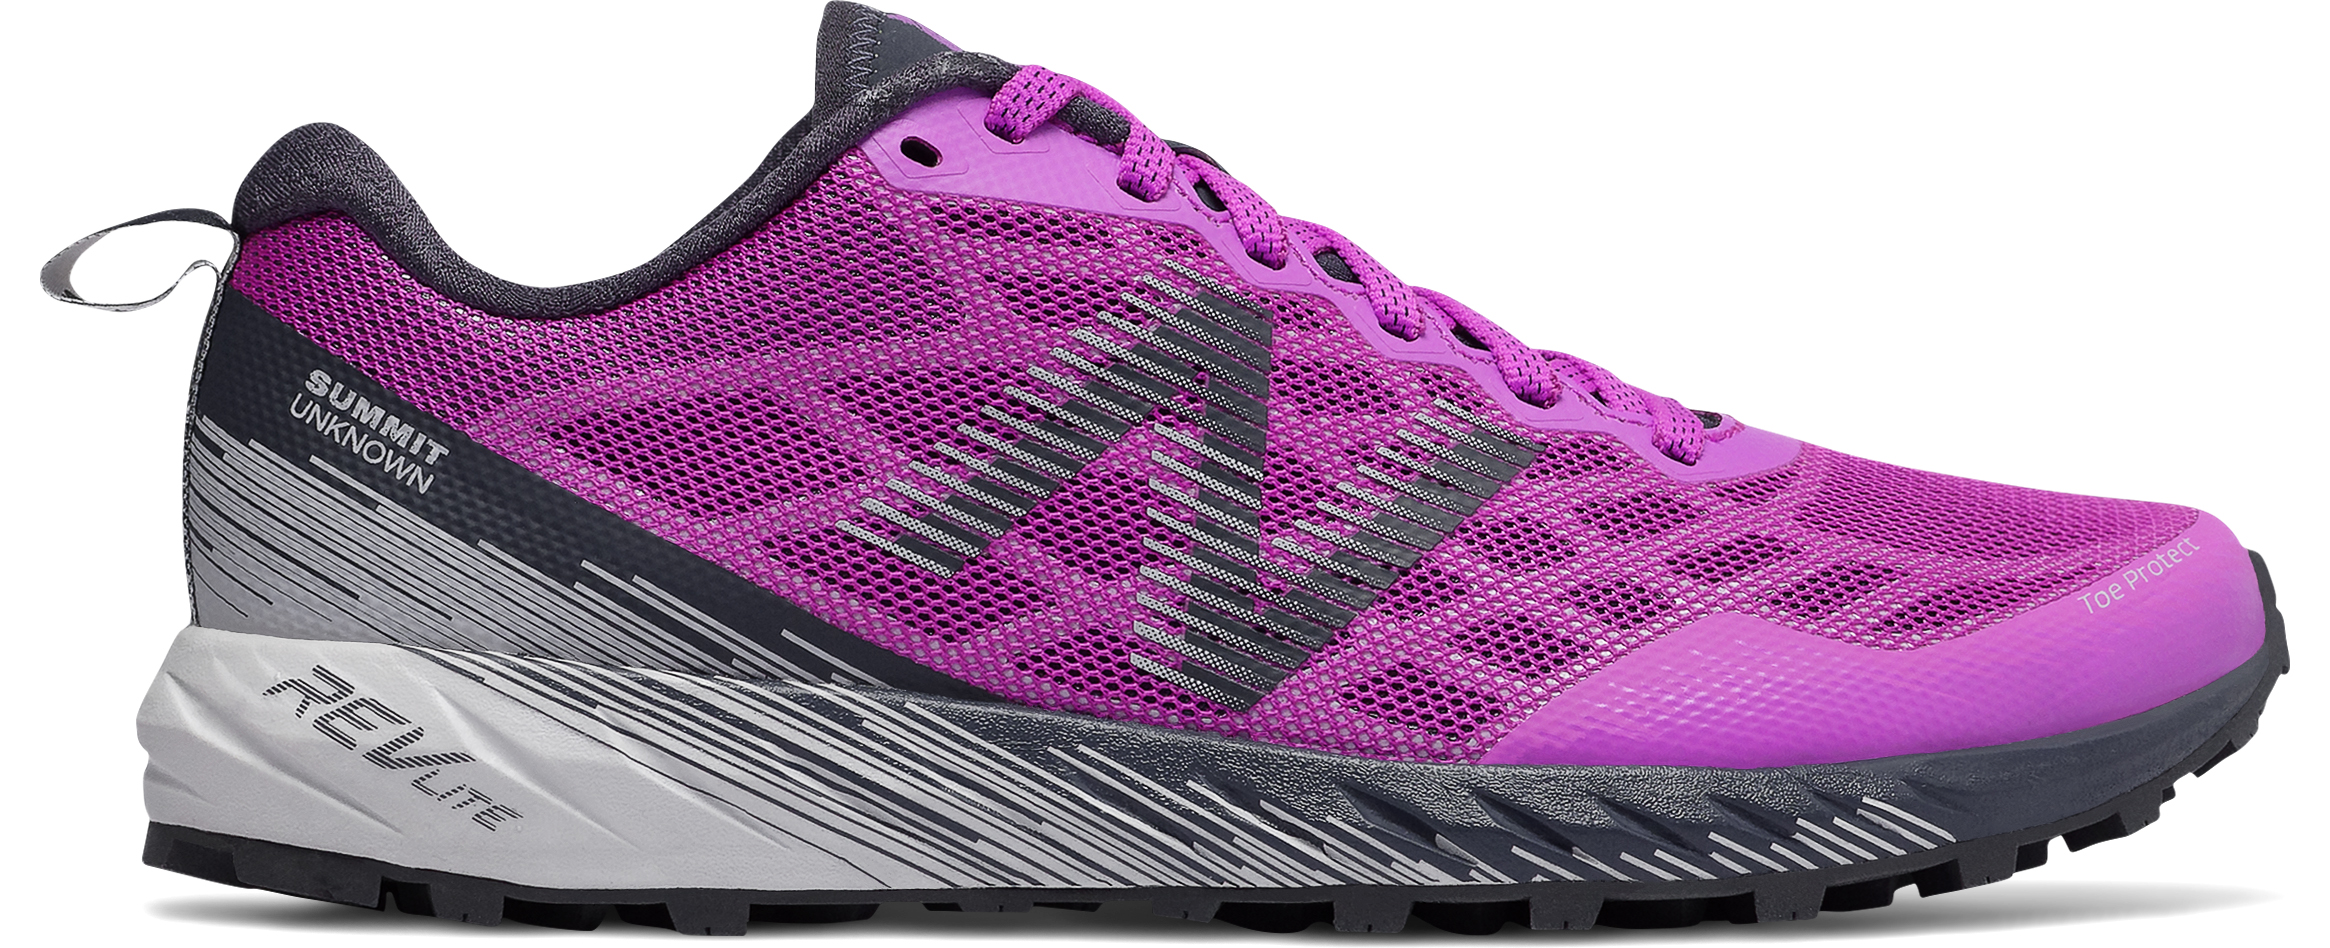 check out 940c1 60b1a New Balance Shoes   MEC